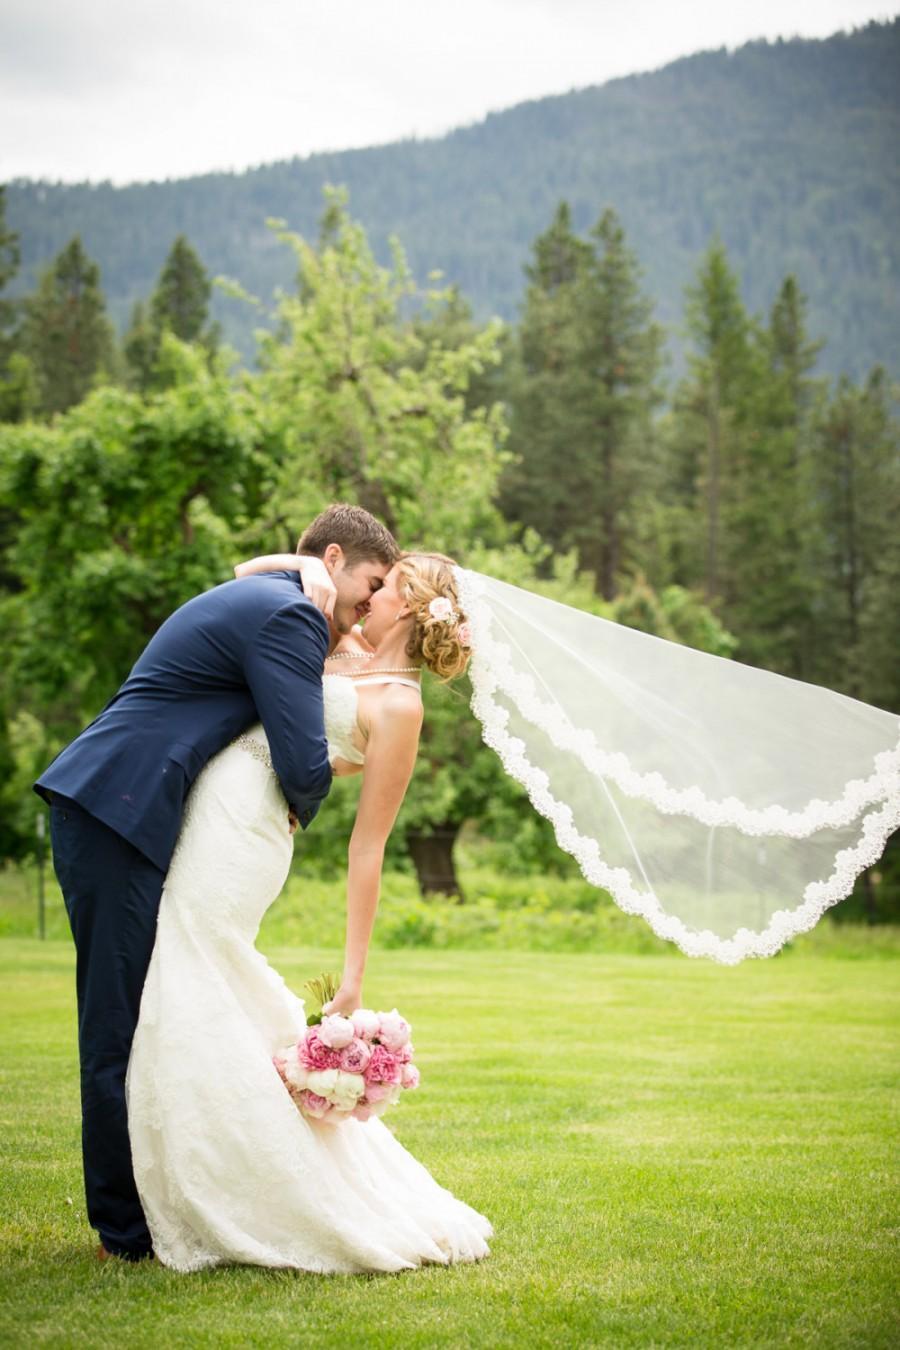 Hochzeit - Lace Wedding Veil - Mantilla - Fingertip Length - Wedding Veil - Ivory Lace Veil